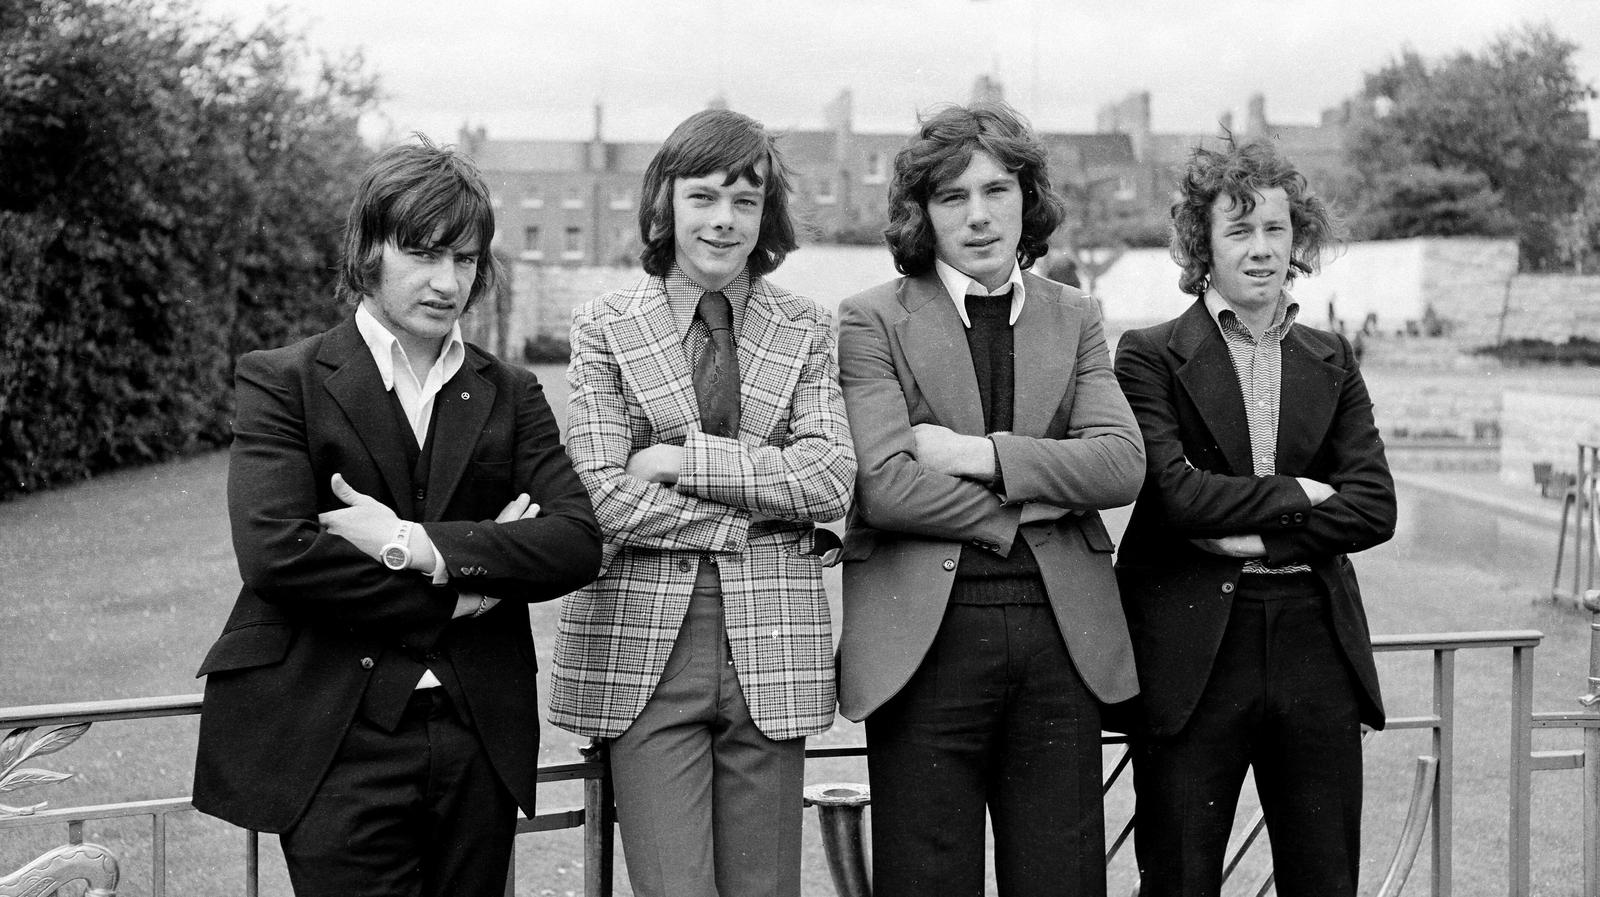 Image - John Murphy, David O'Leary, Frank Stapleton and Liam Brady at an Irish Arsenal players photocall